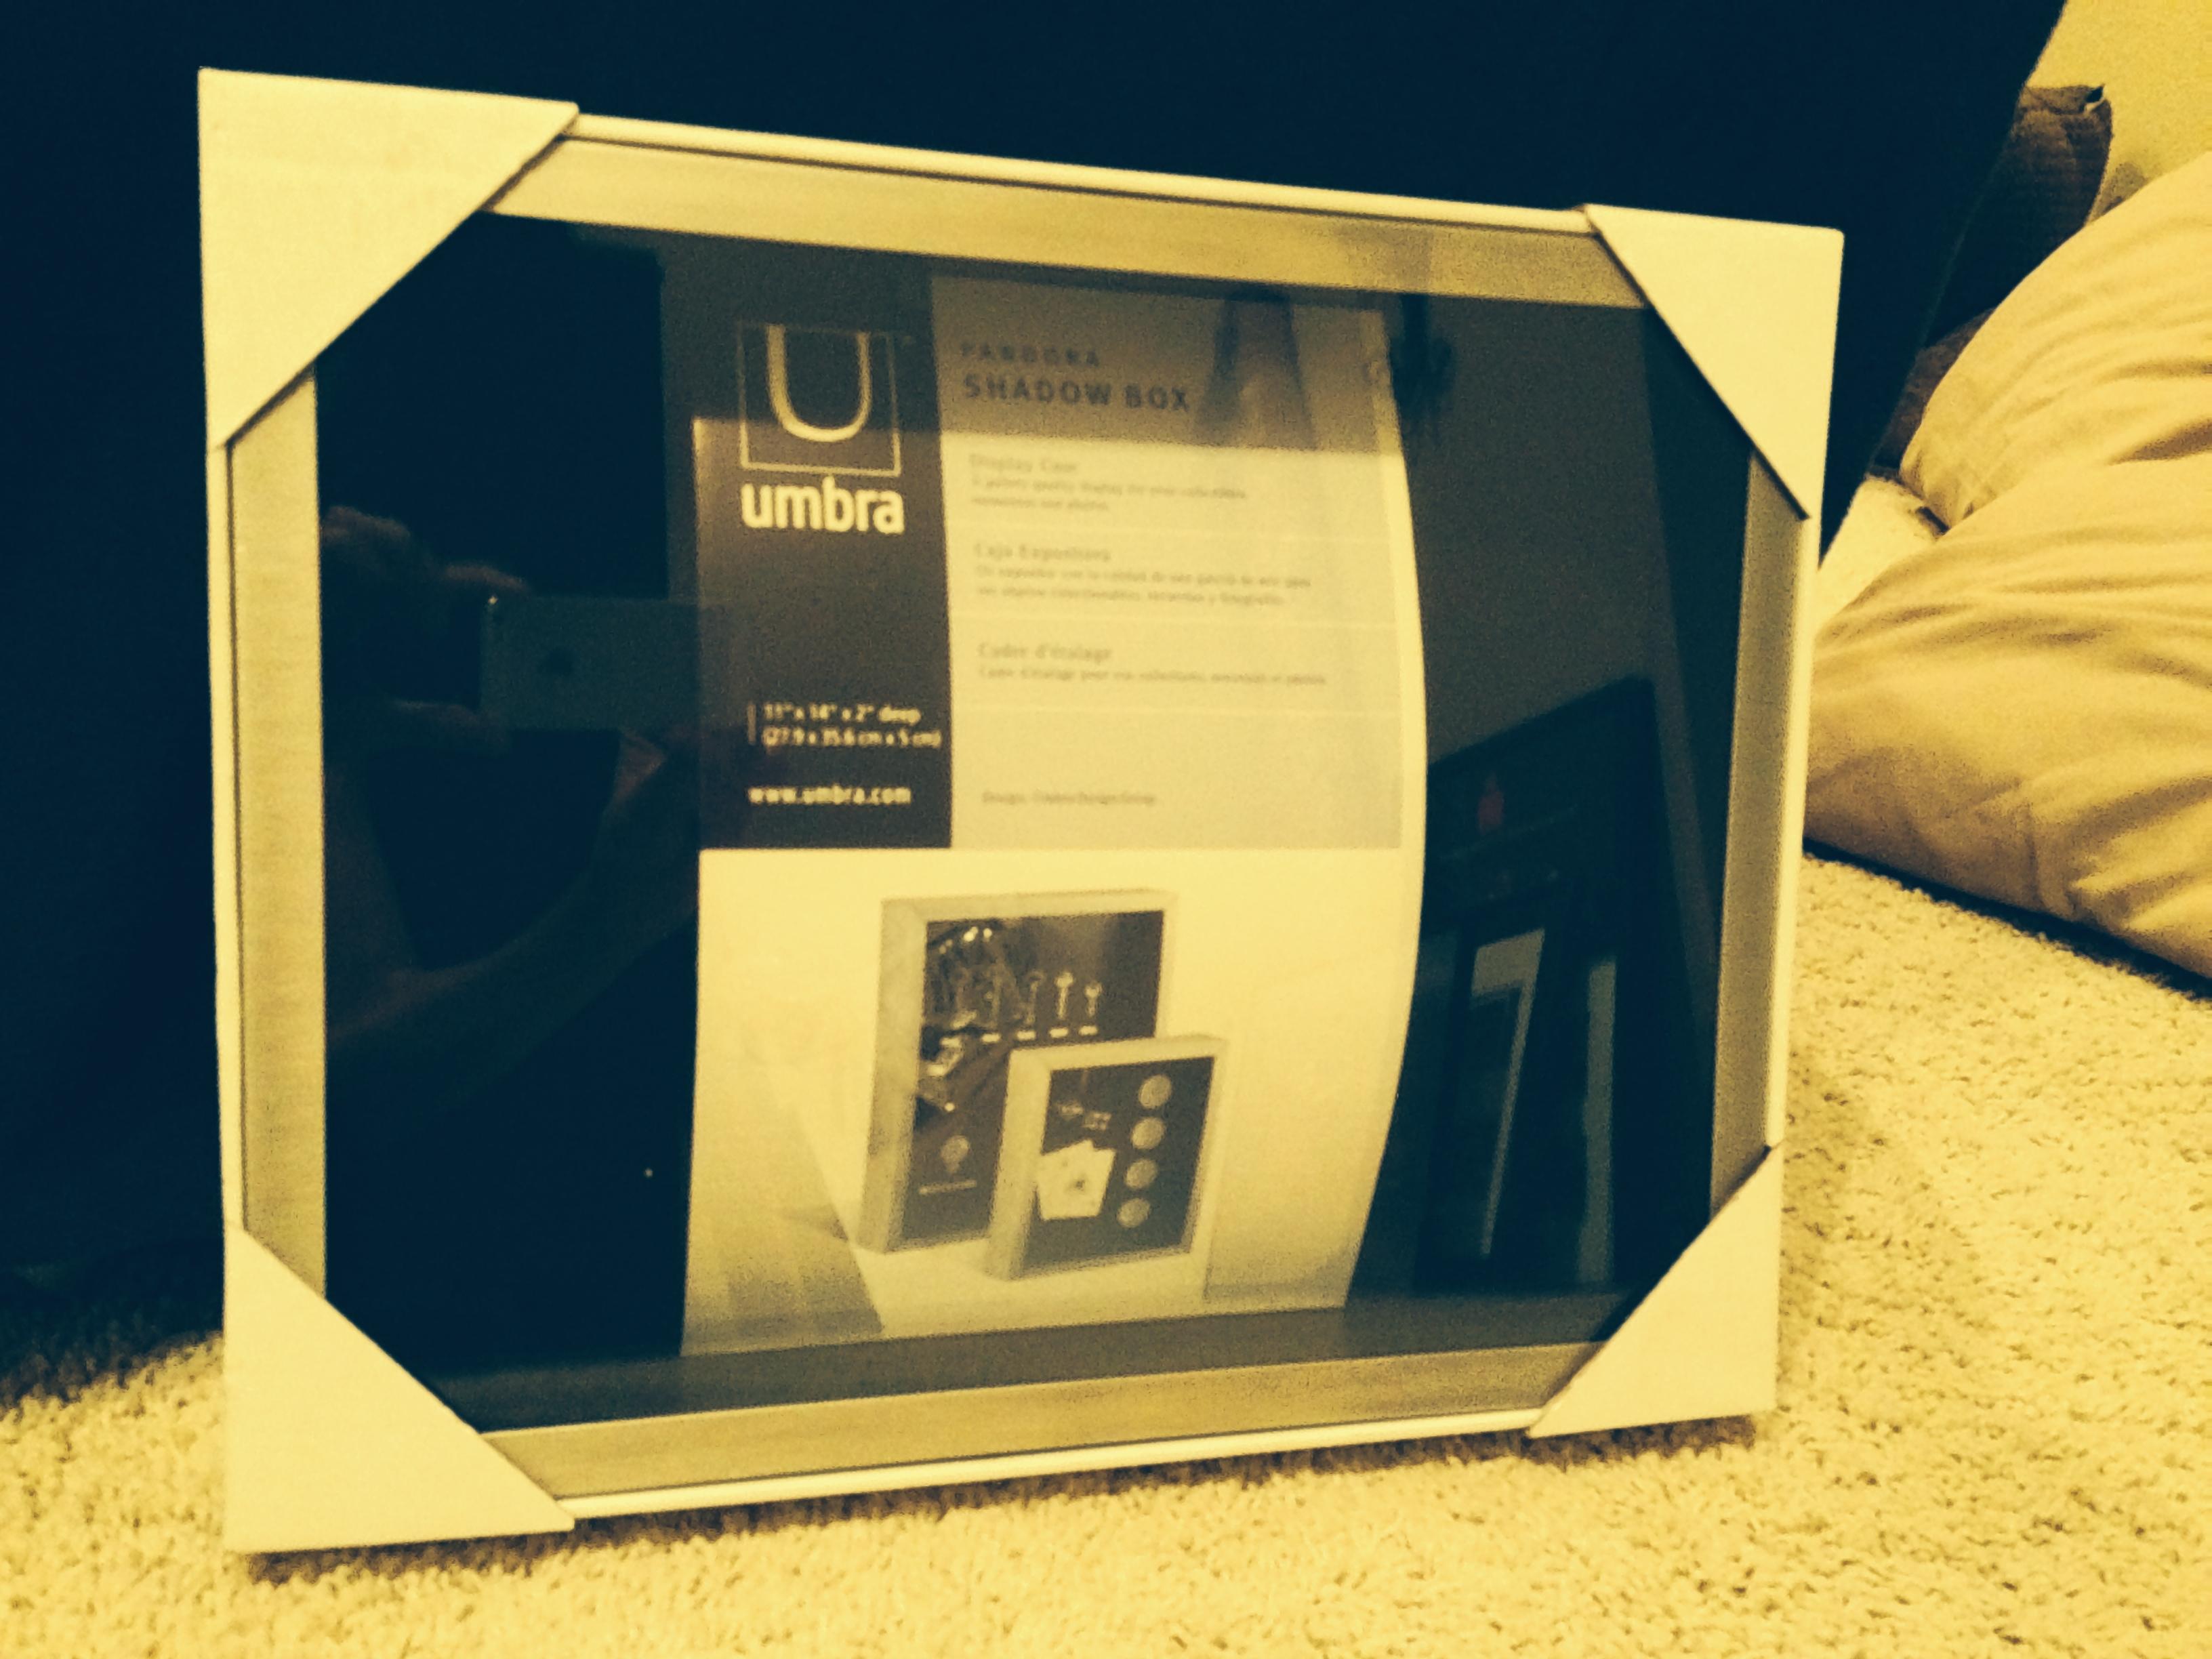 Umbra Nickel Pandora Shadow Box (11 x 14)